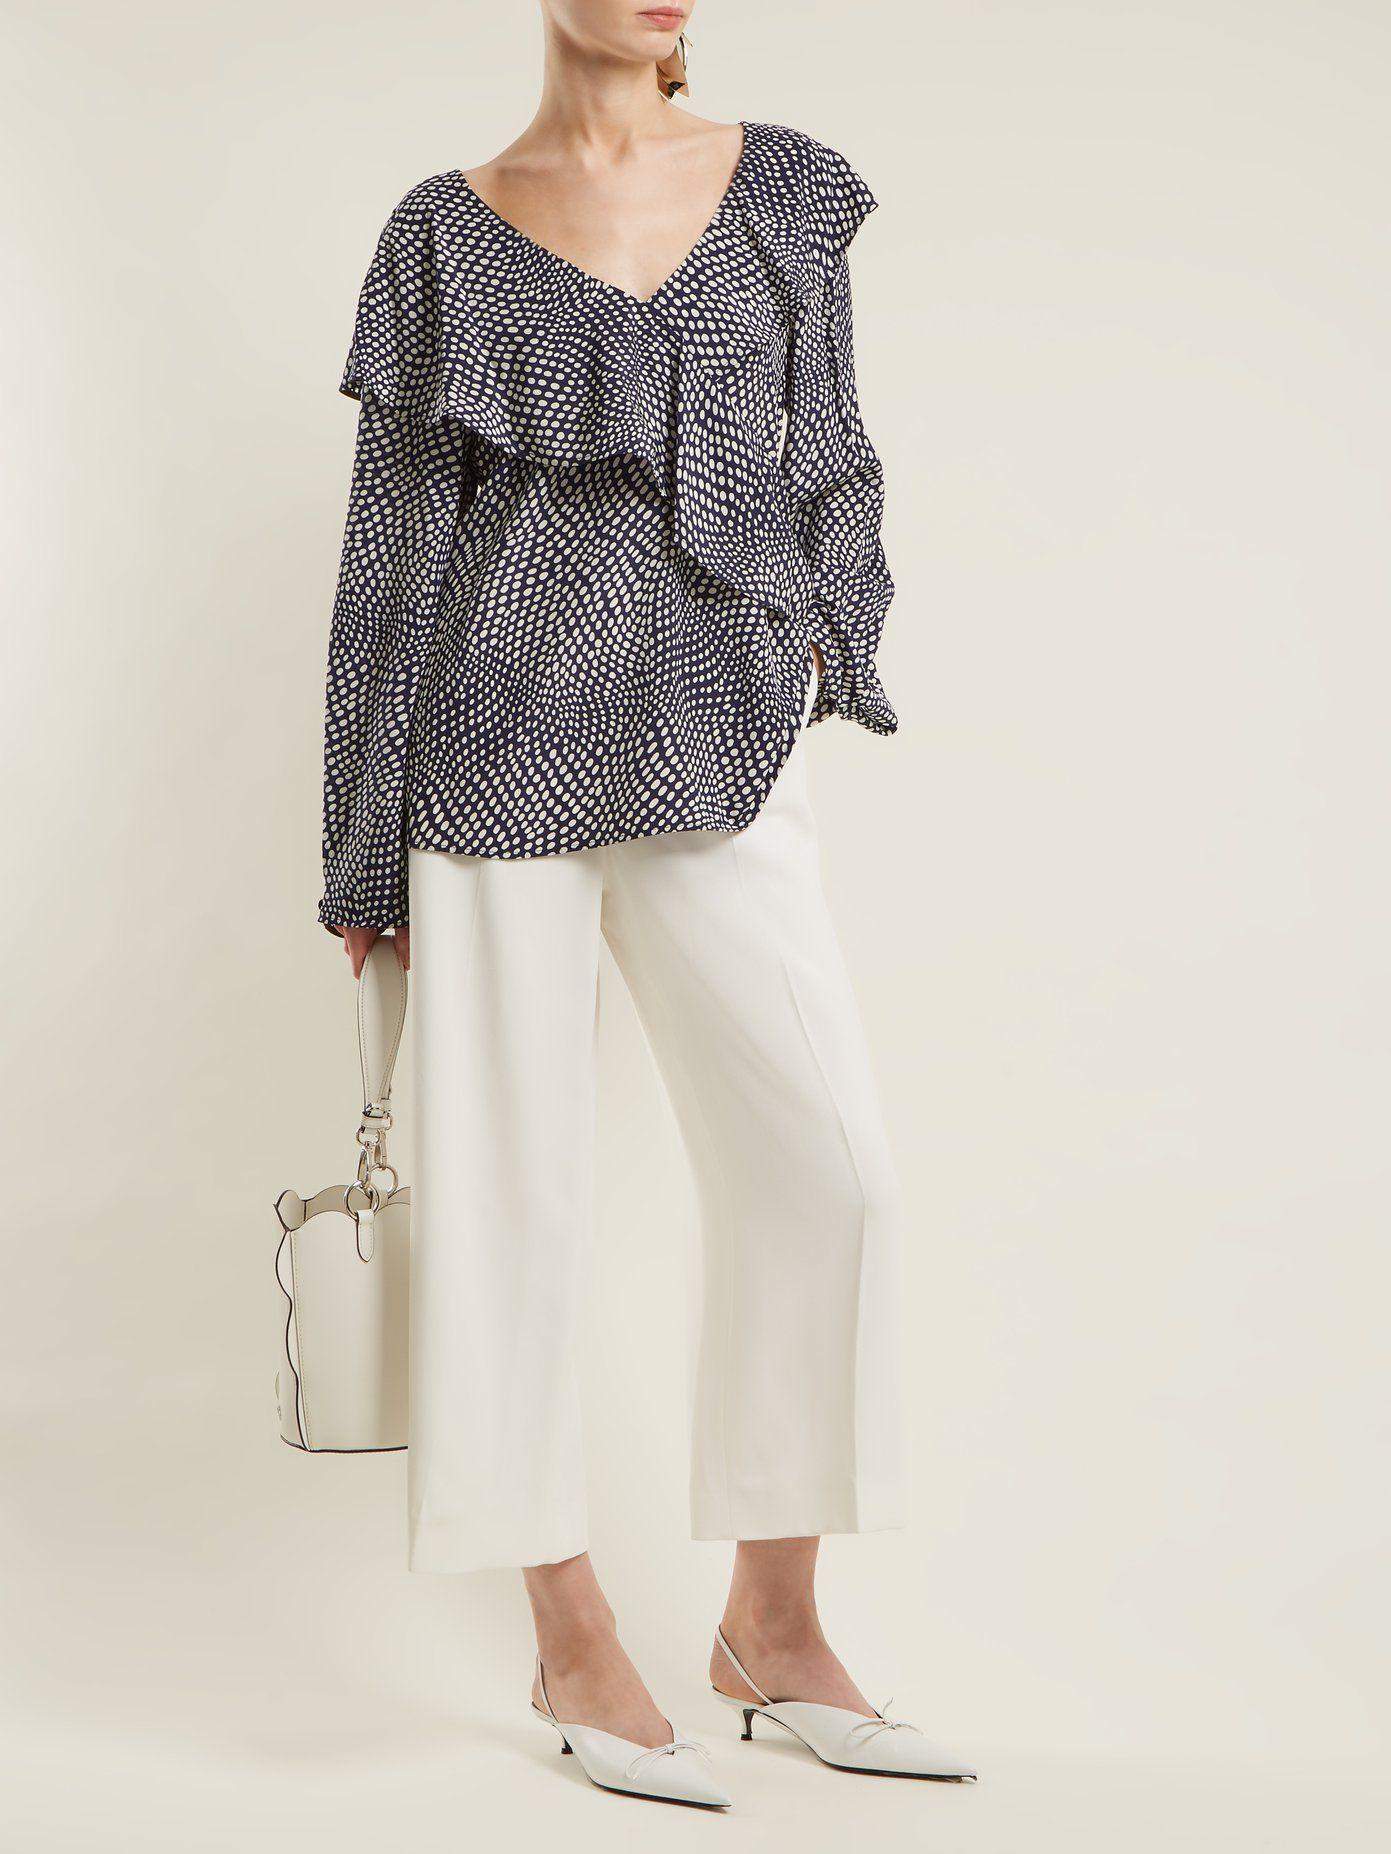 Cheap 100% Guaranteed Official Site Online Easton polka-dot print silk wrap top Diane Von Fürstenberg Cheap Comfortable Footlocker Sale Online Amazon Footaction ht9o5jM